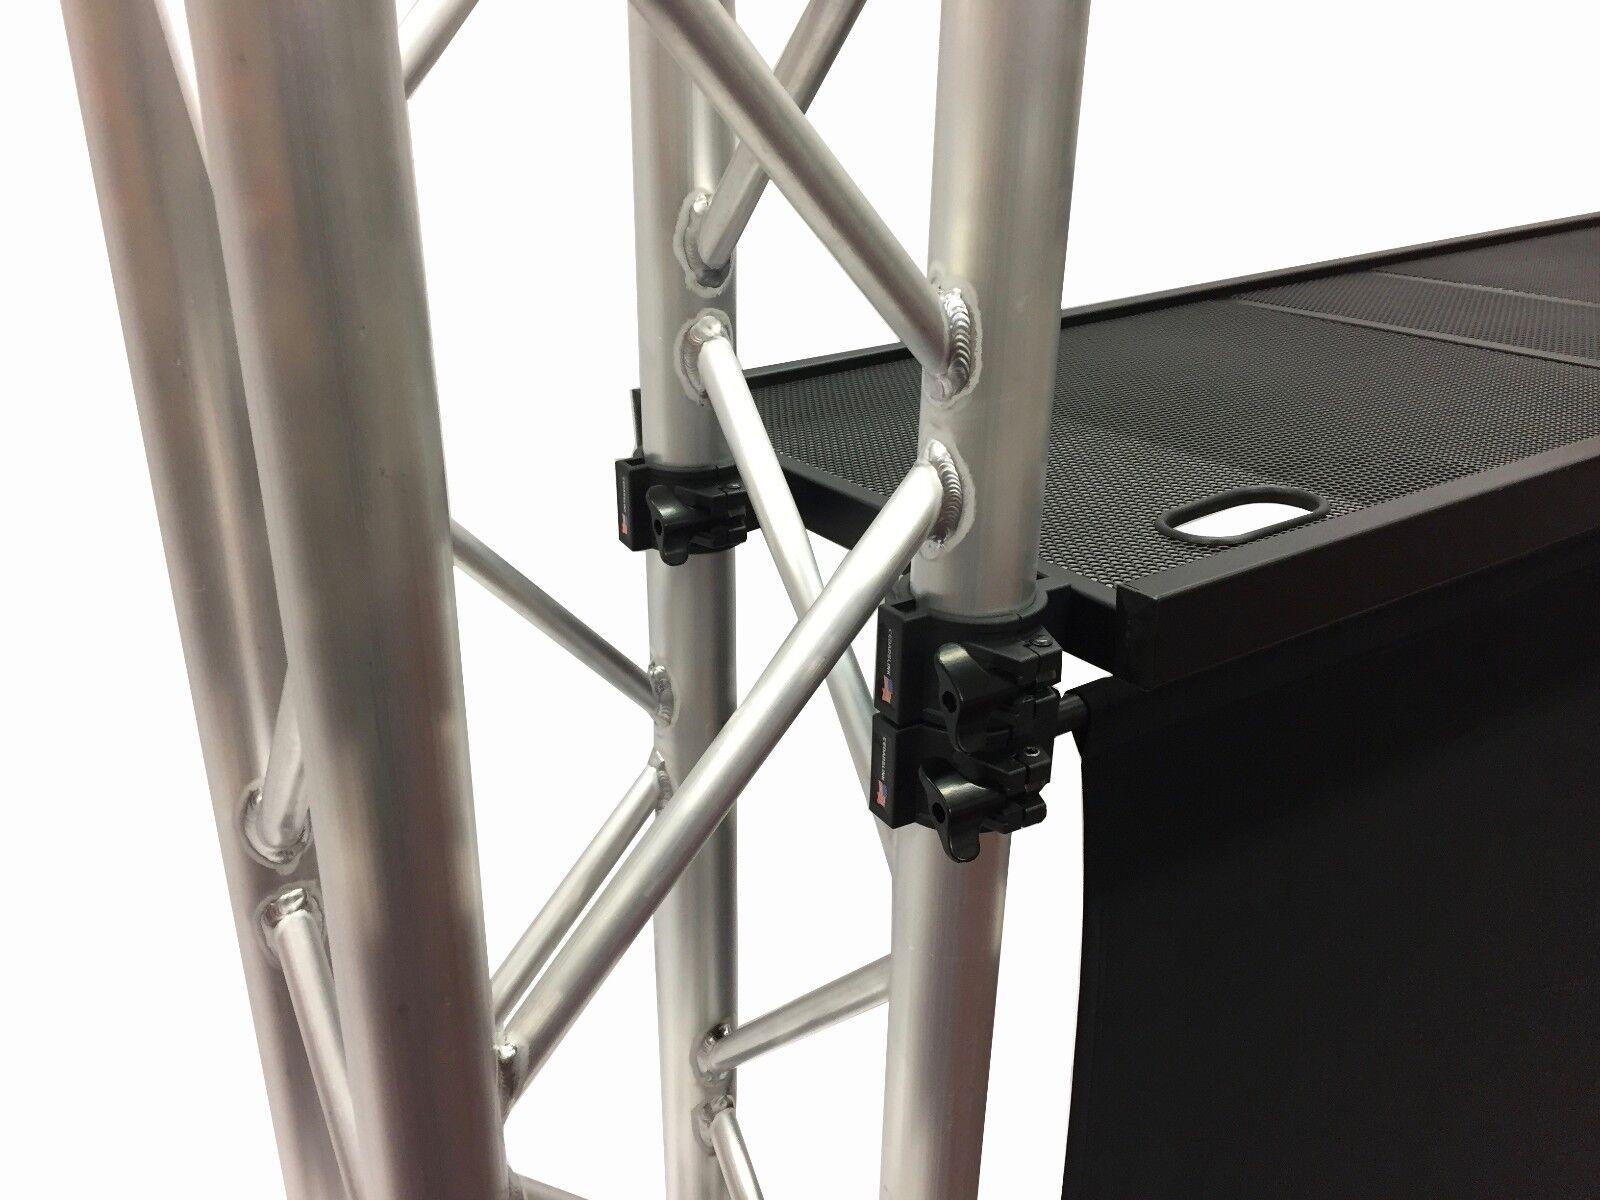 DJ Event Facade White/Black Scrims Aluminum Truss Booth 6.56' Arch truss System